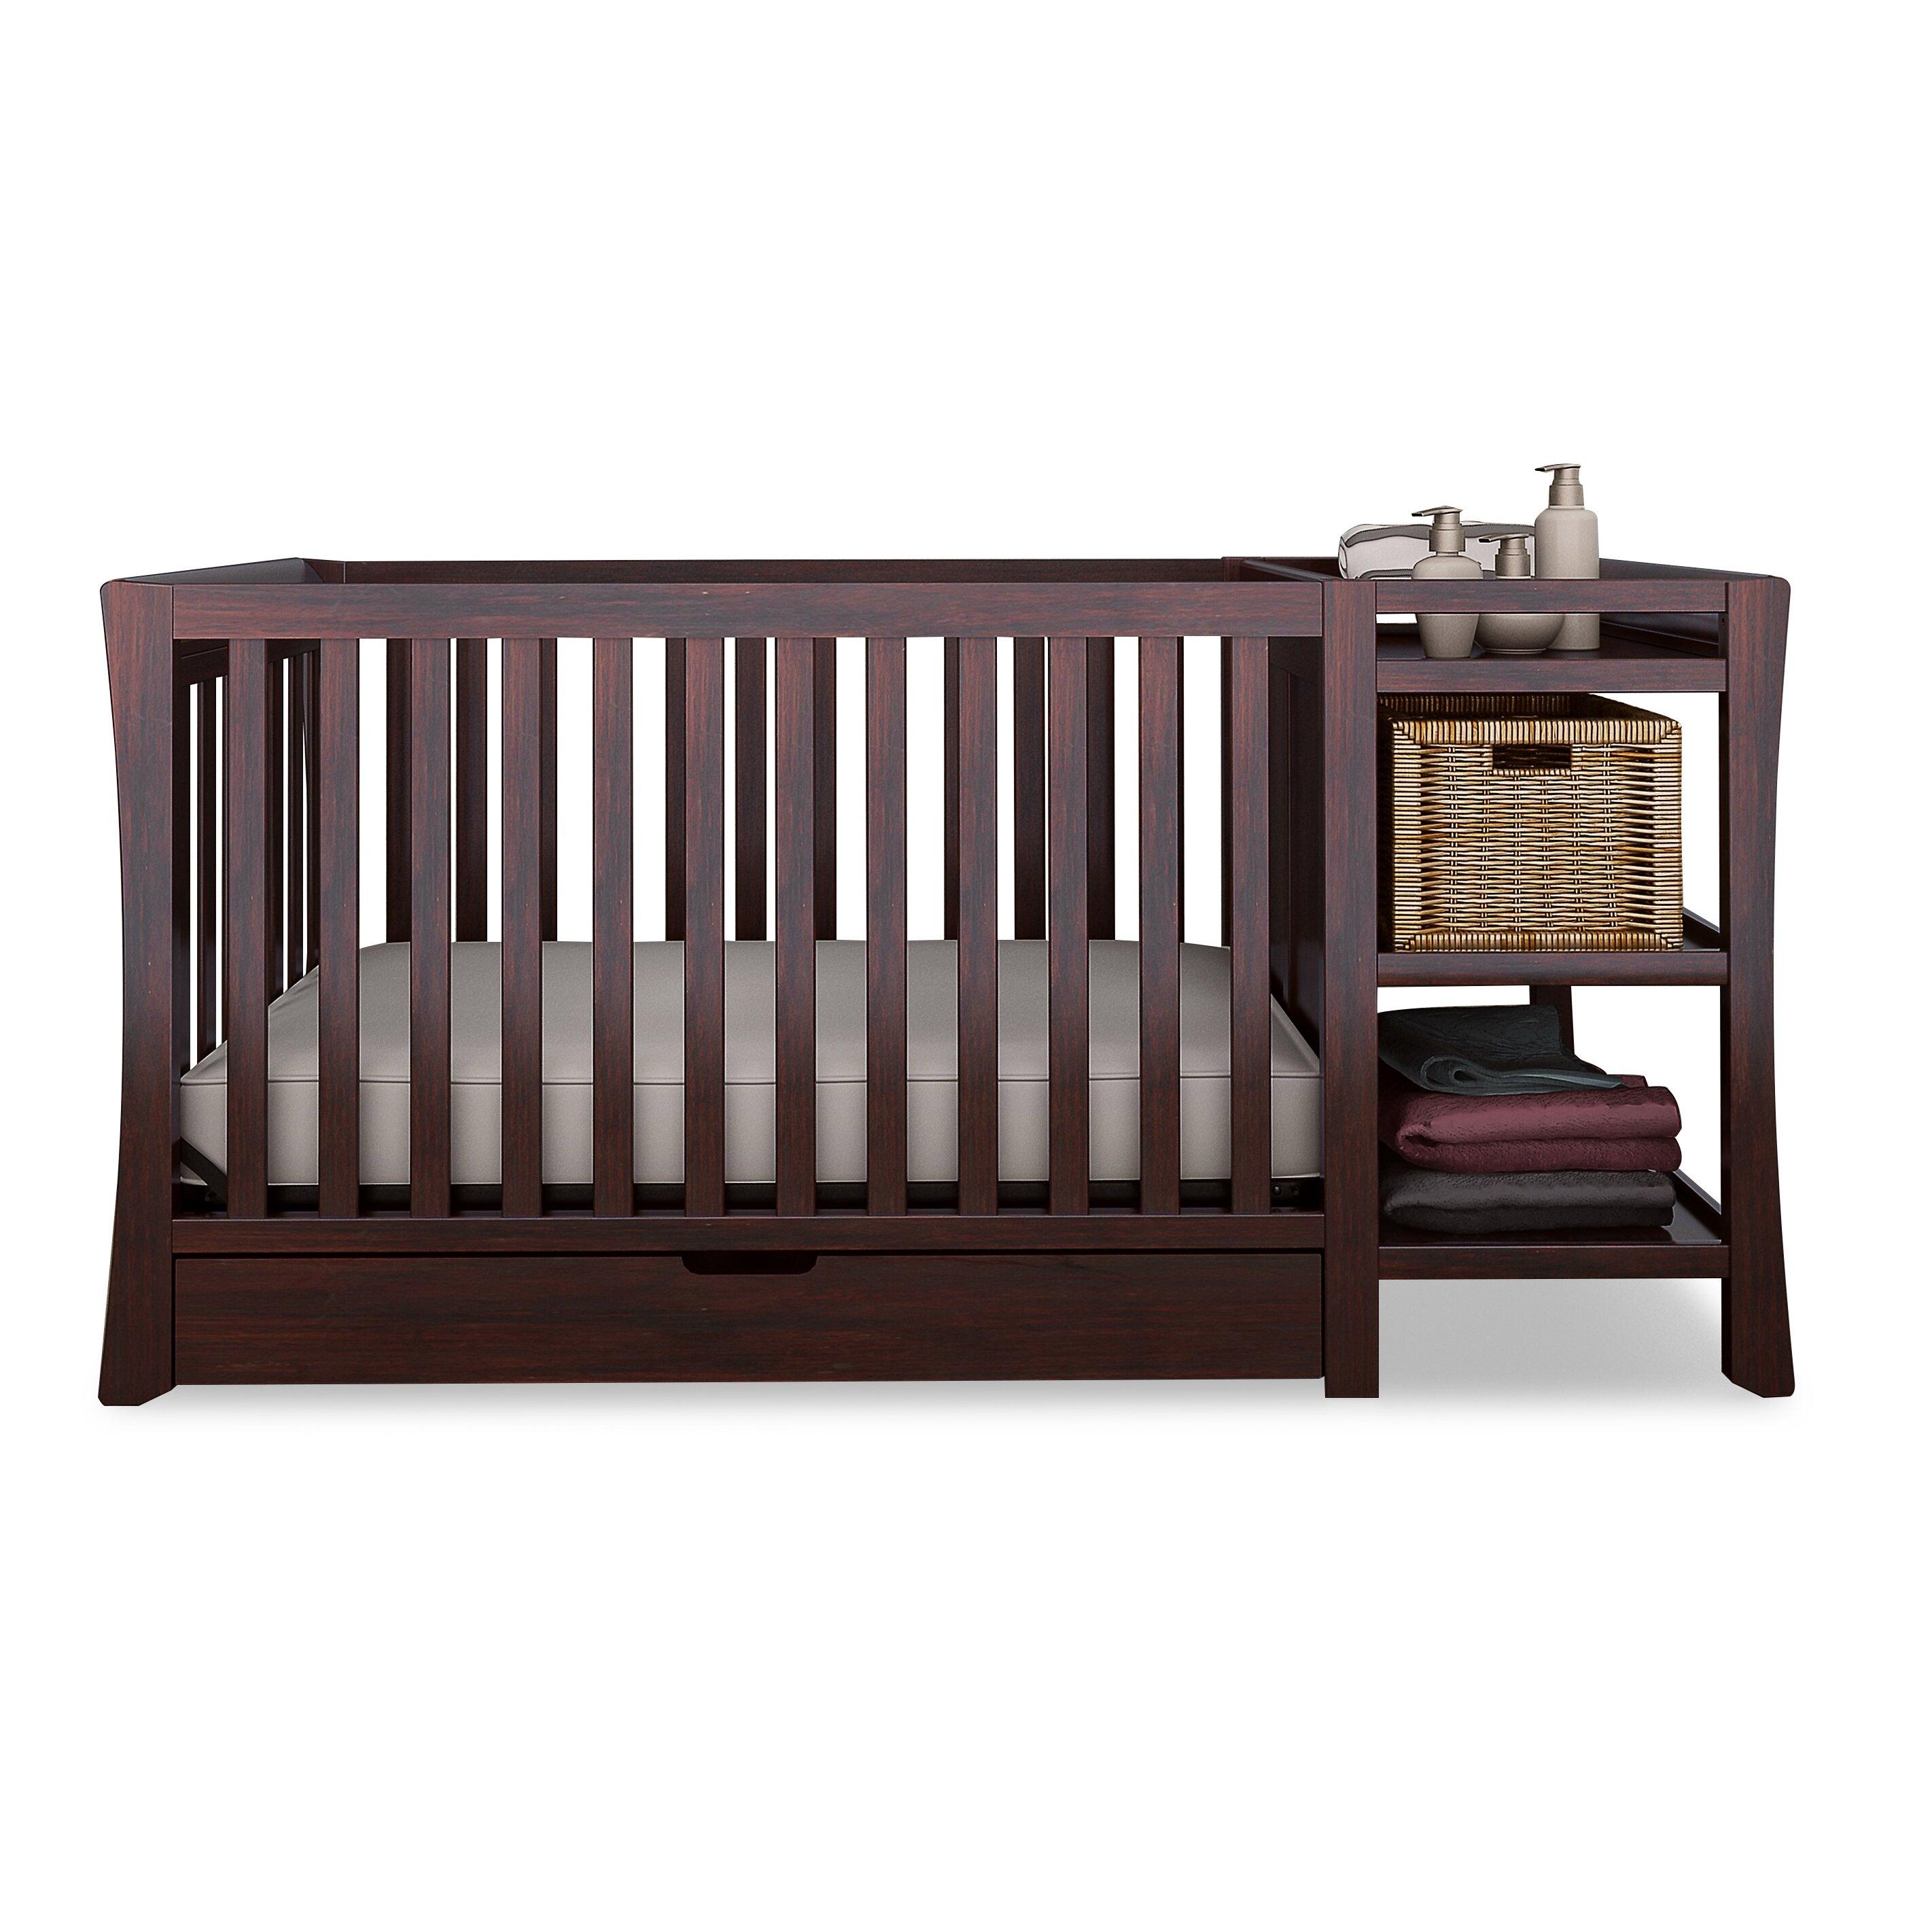 Graco Mason Crib Conversion Kit Creative Ideas of Baby Cribs